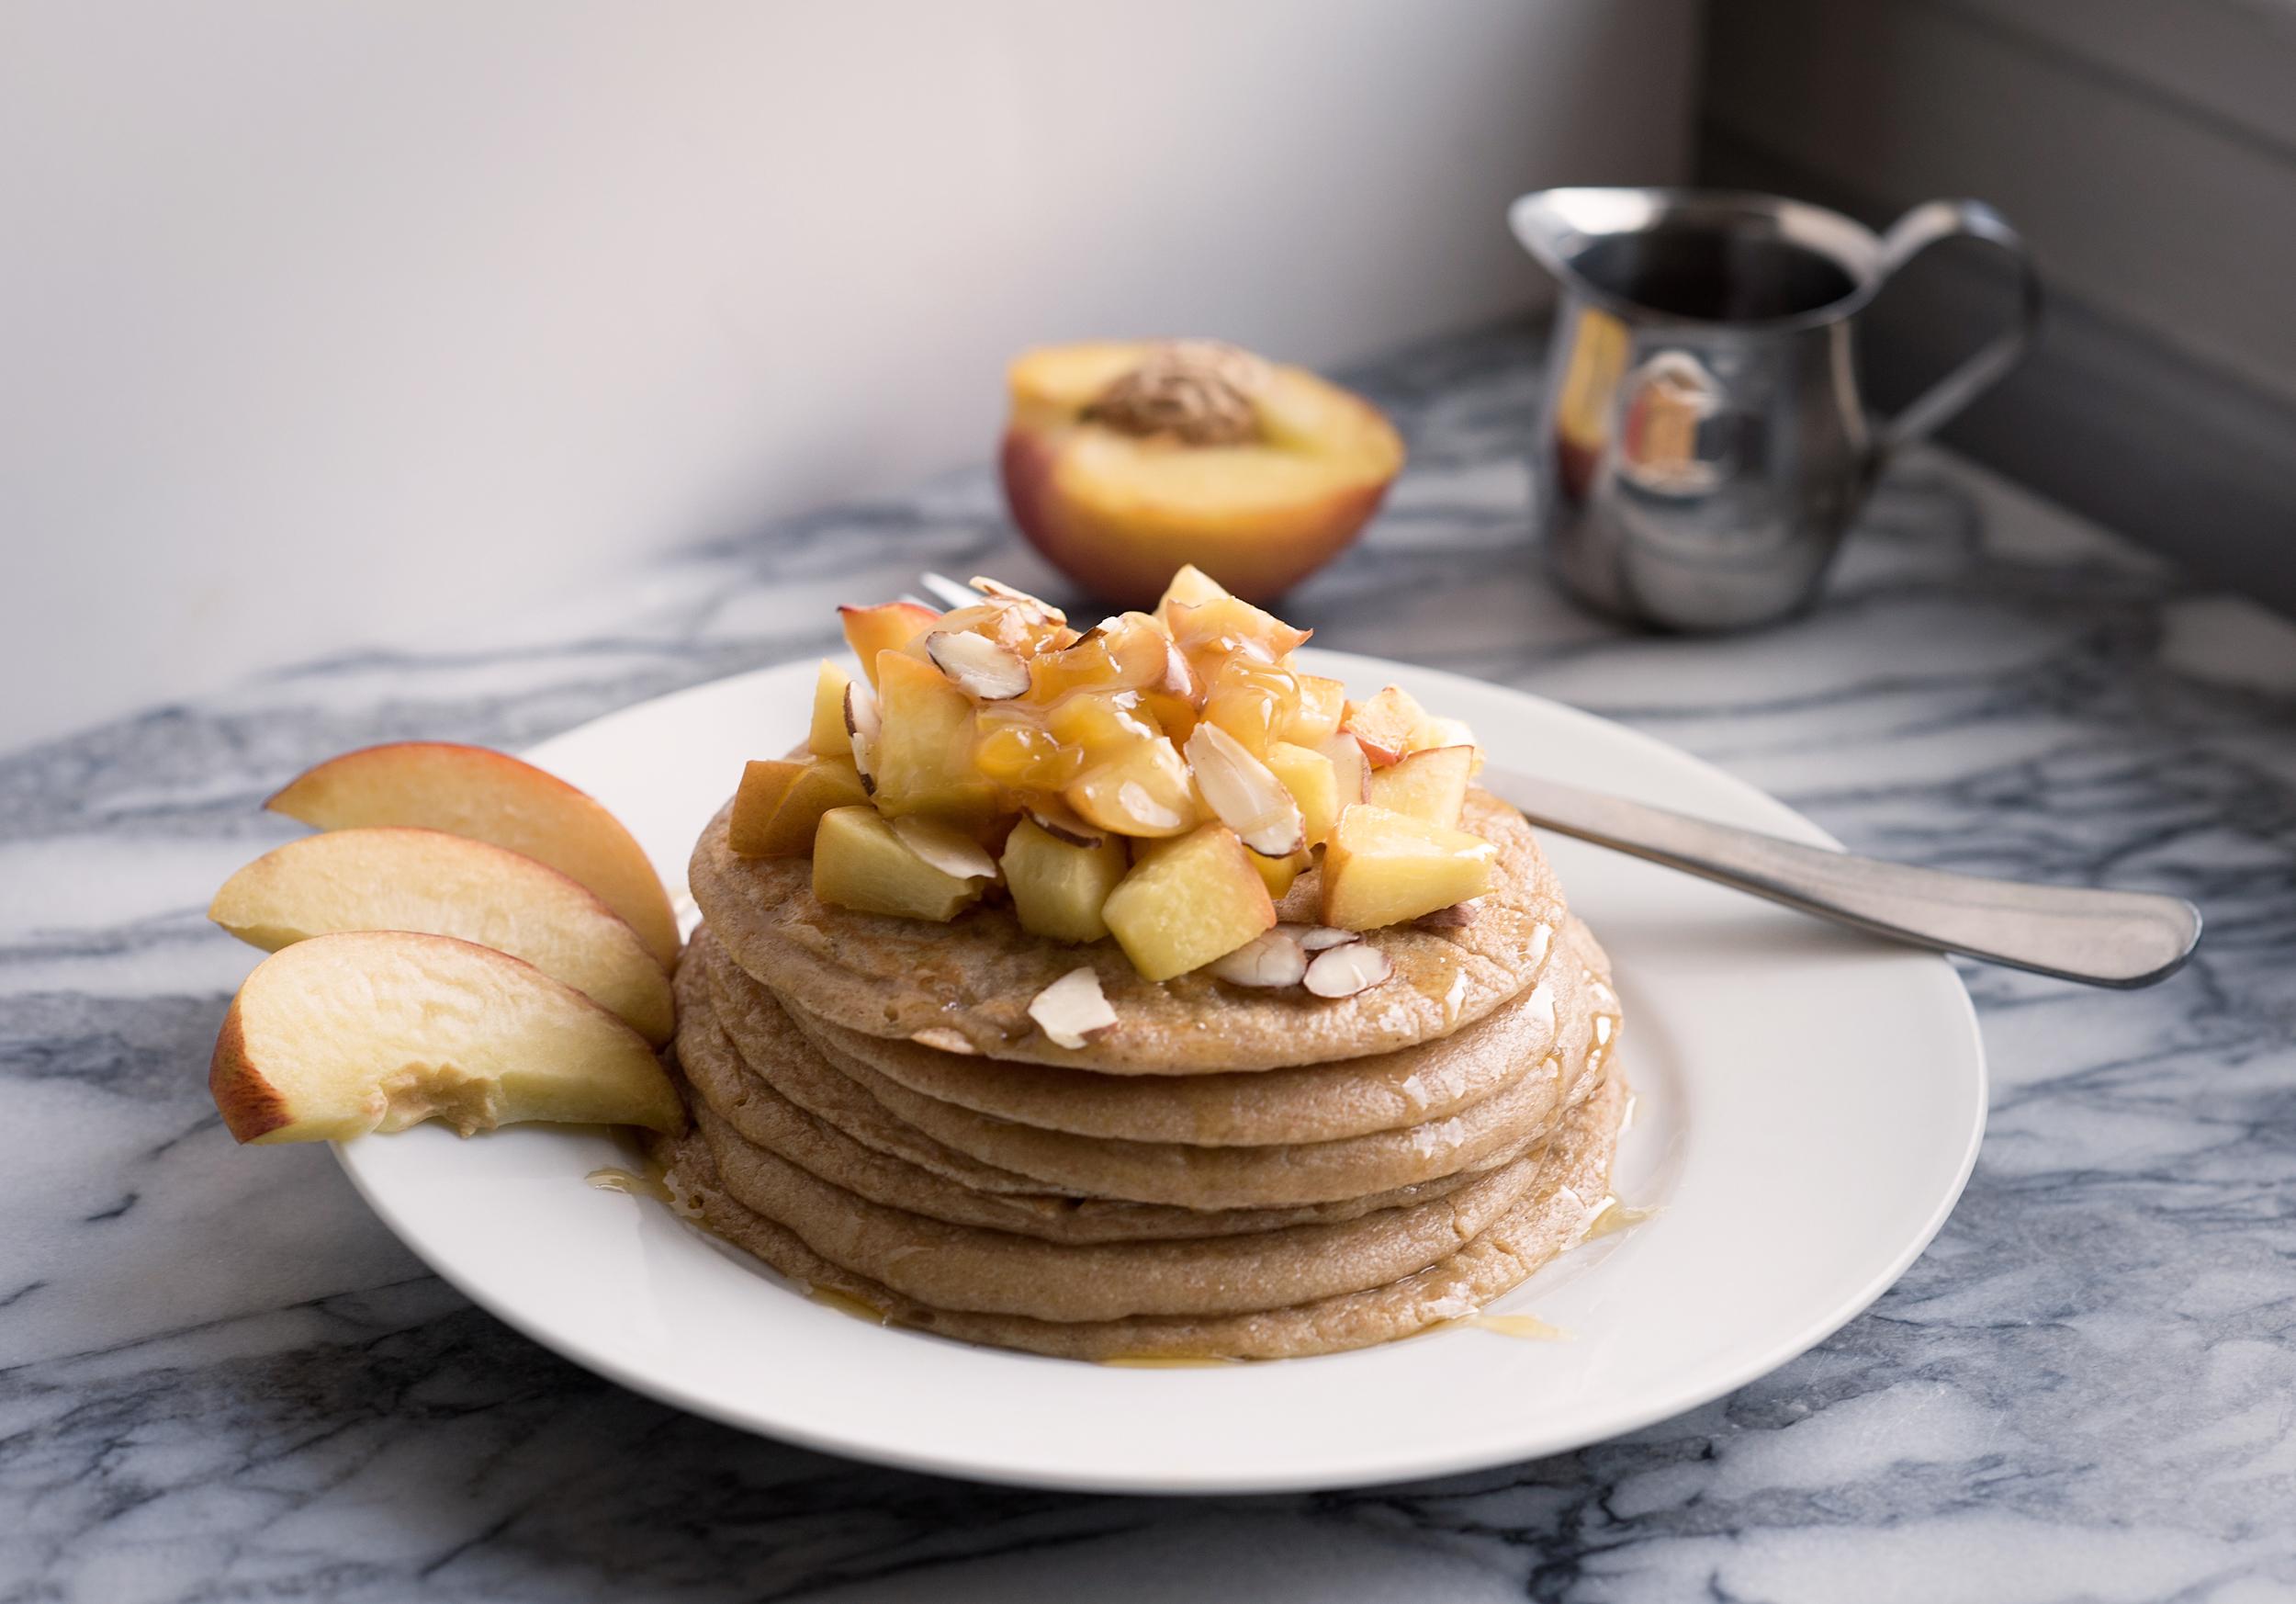 peach-pancake-healthy-made-with-whole-wheat-greek-yogurt-by-raquel-paiva